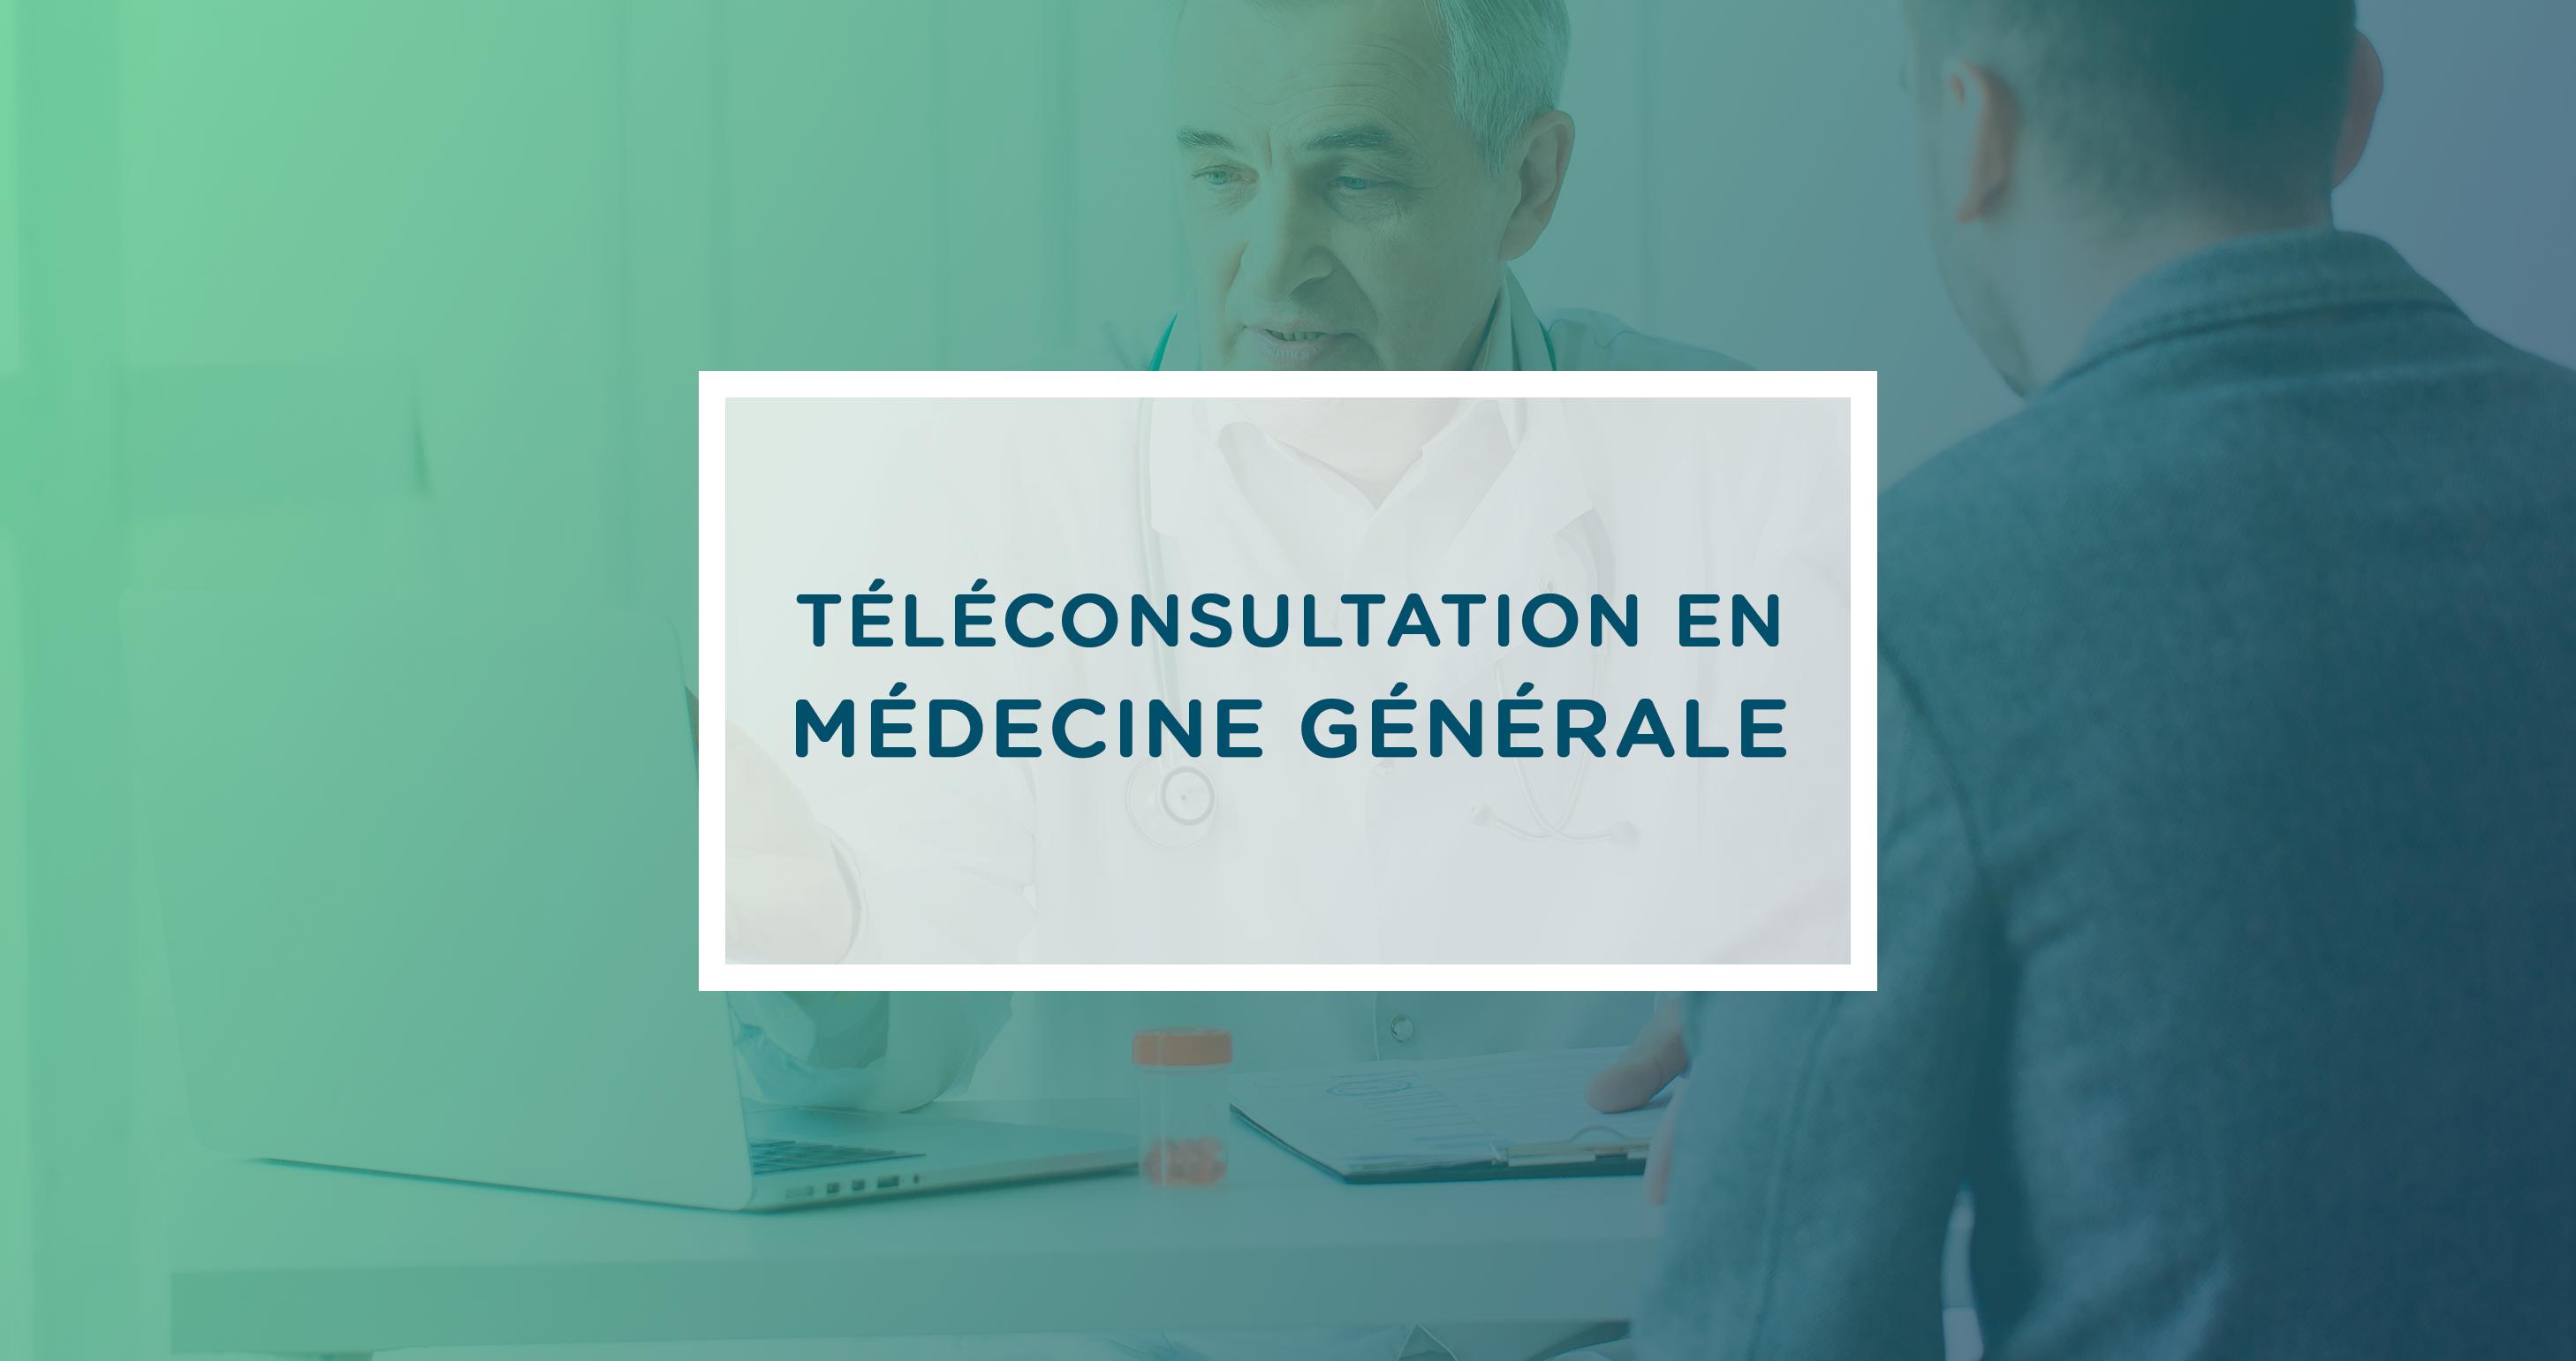 medecine-generale-teleconsultation